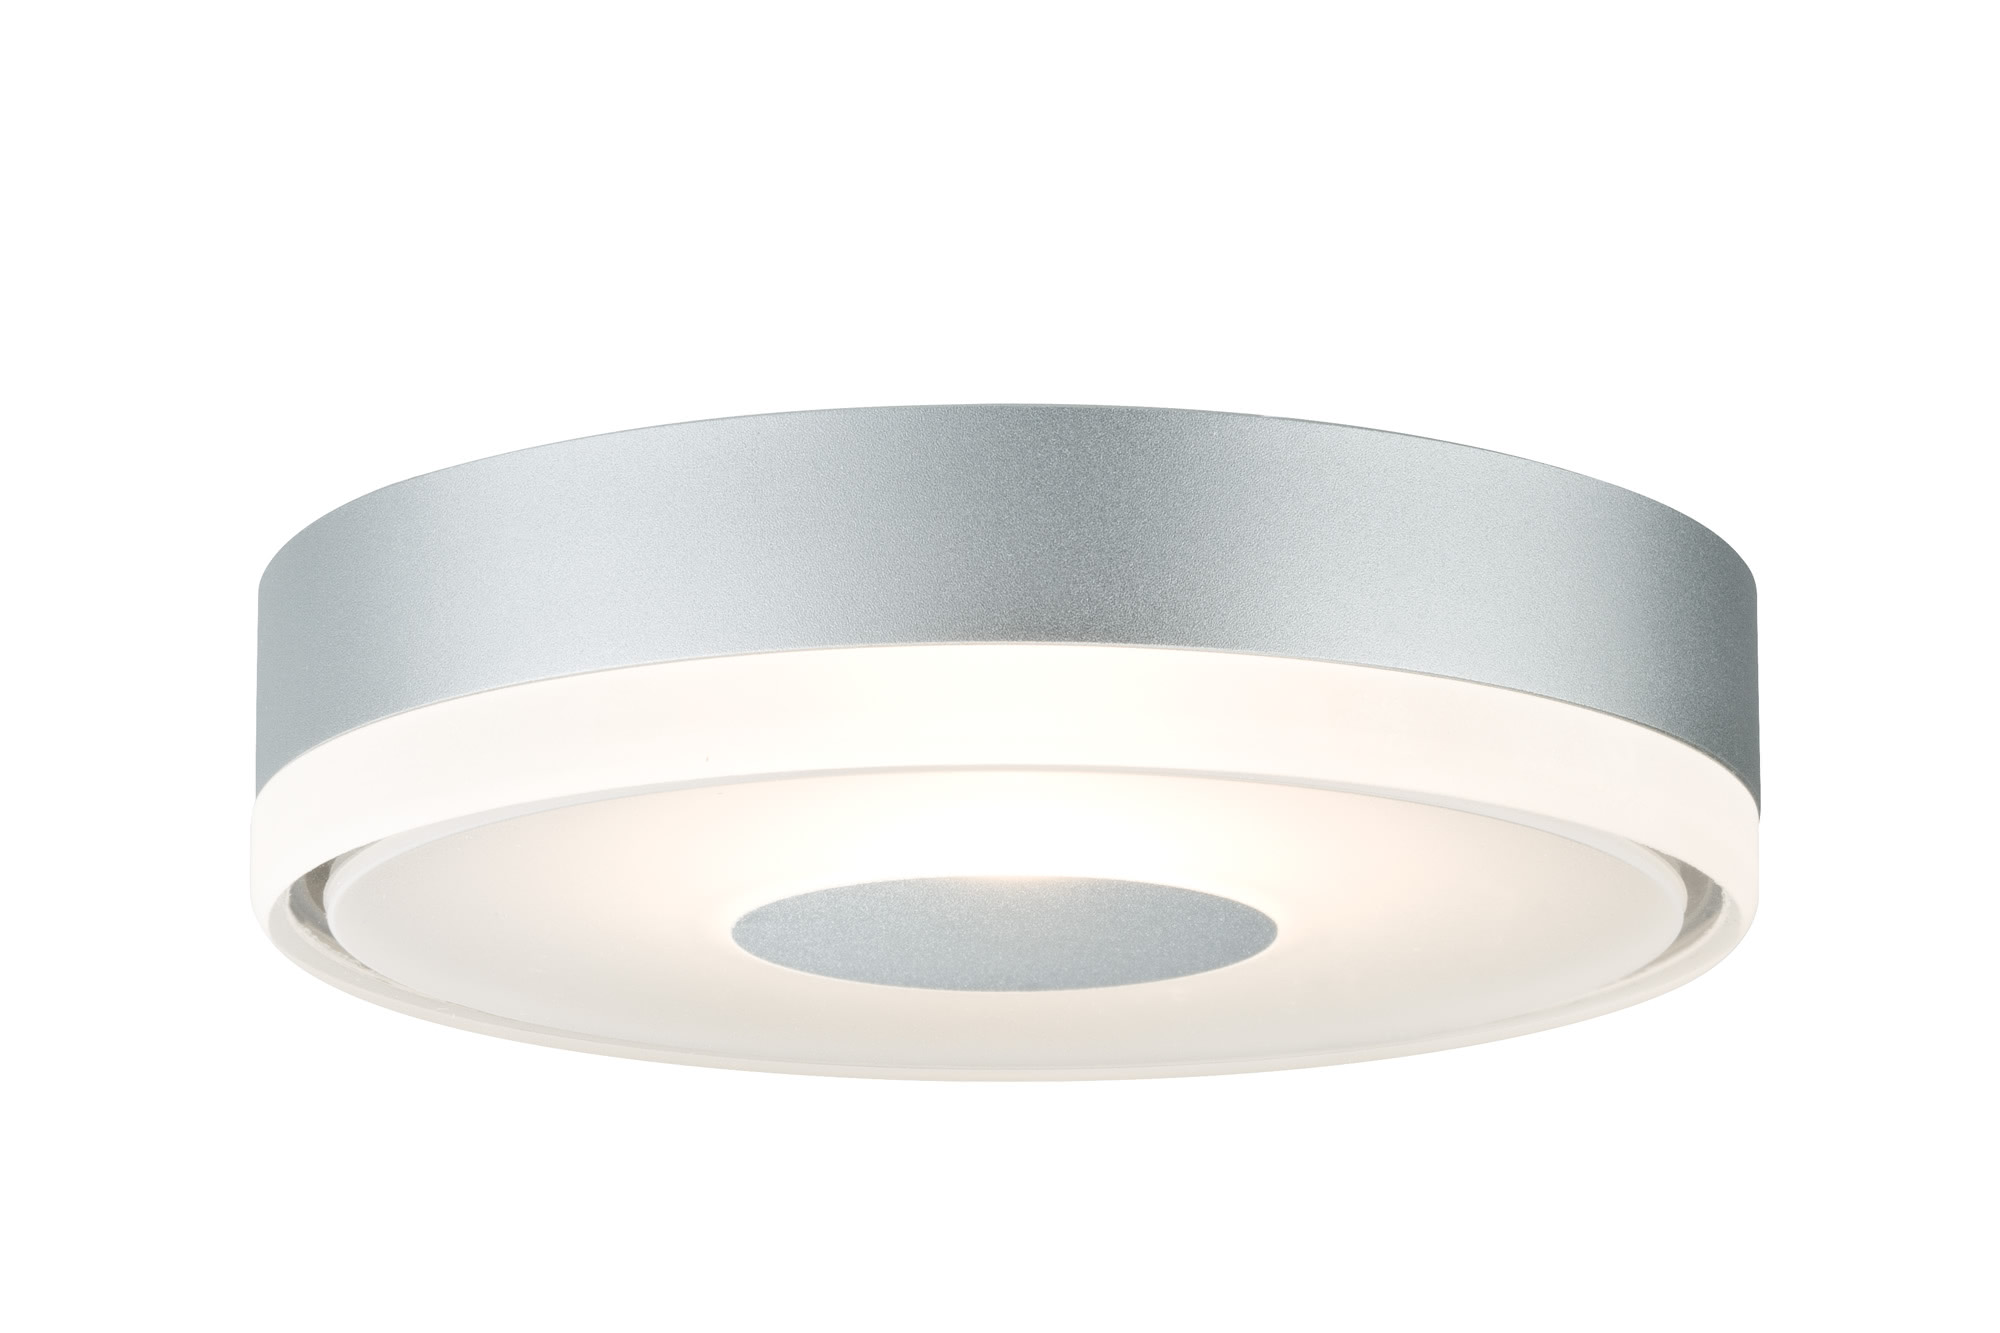 Paulmann. 92542 Светильник Premium EBL Set Circle LED 3x4W Acryl